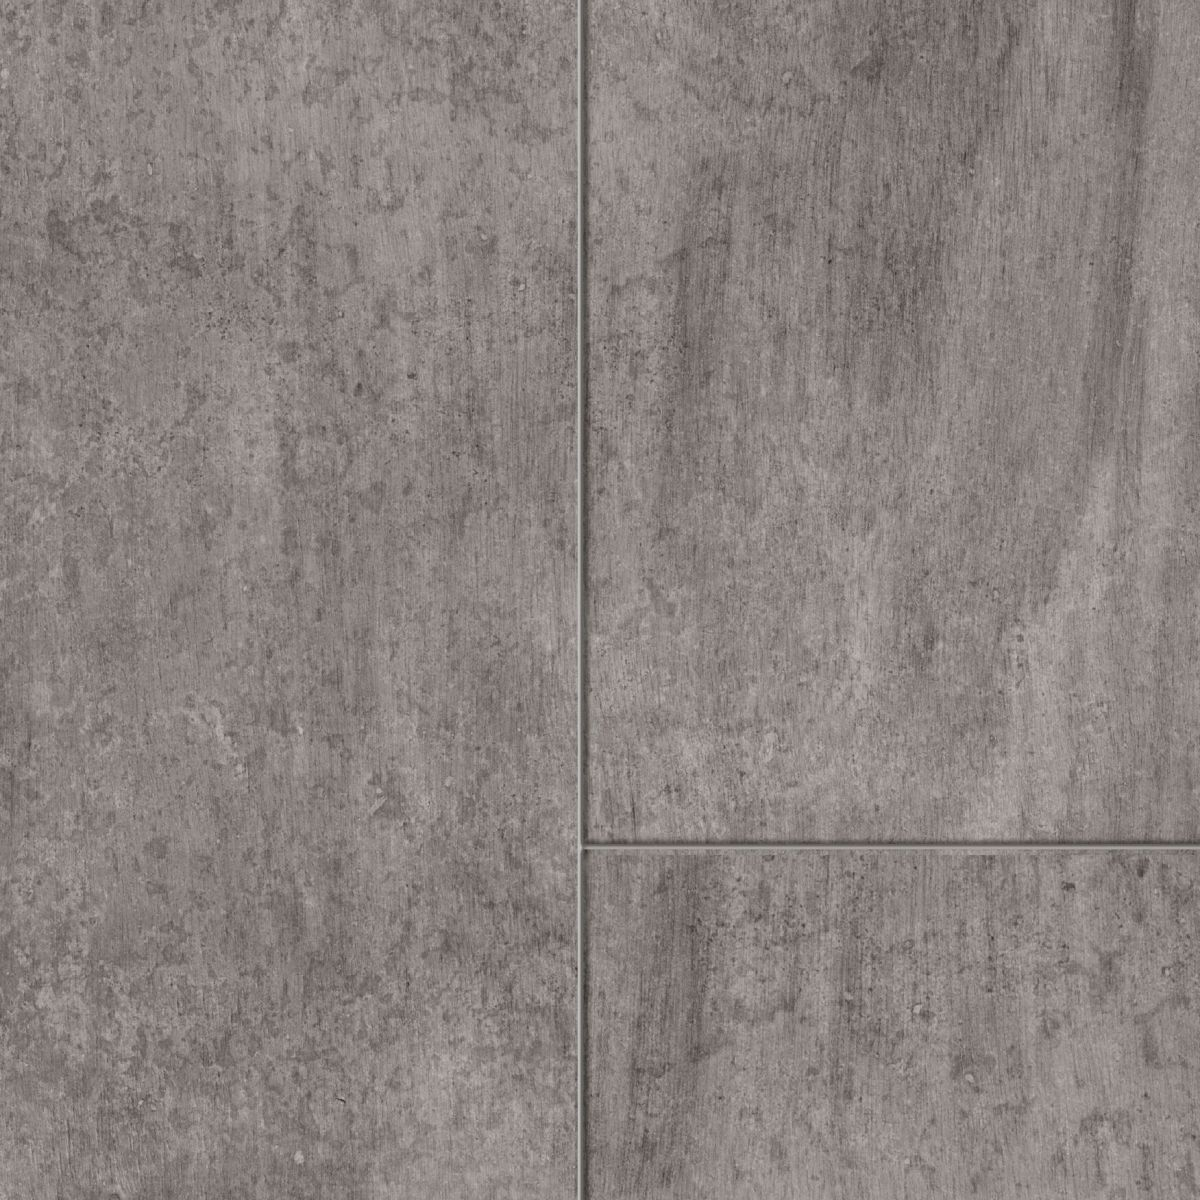 Avatara vloeren steen O9